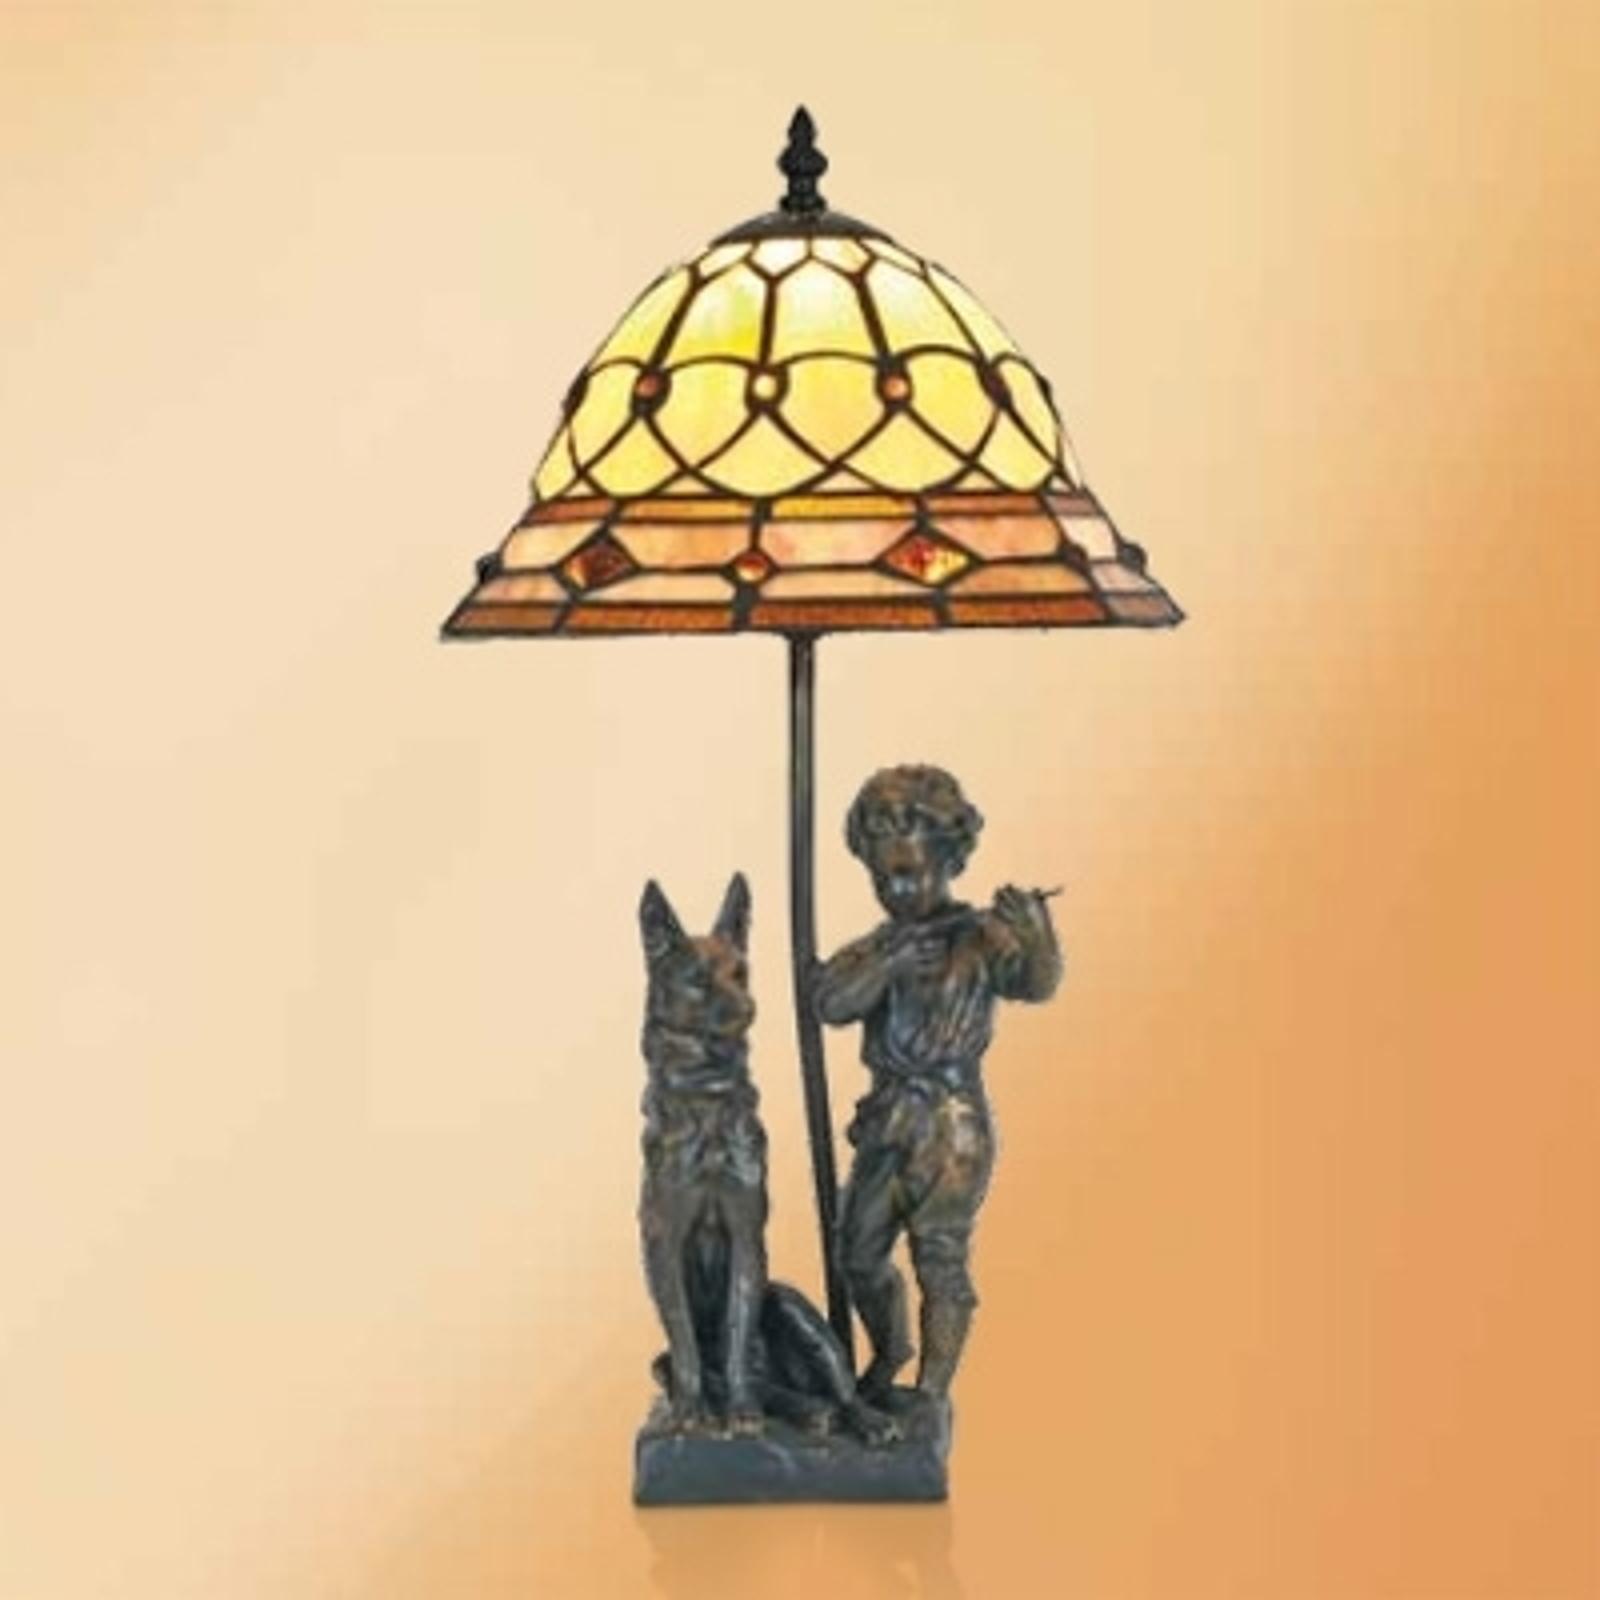 Hugo - stolní lampa s figurami, Tiffany styl